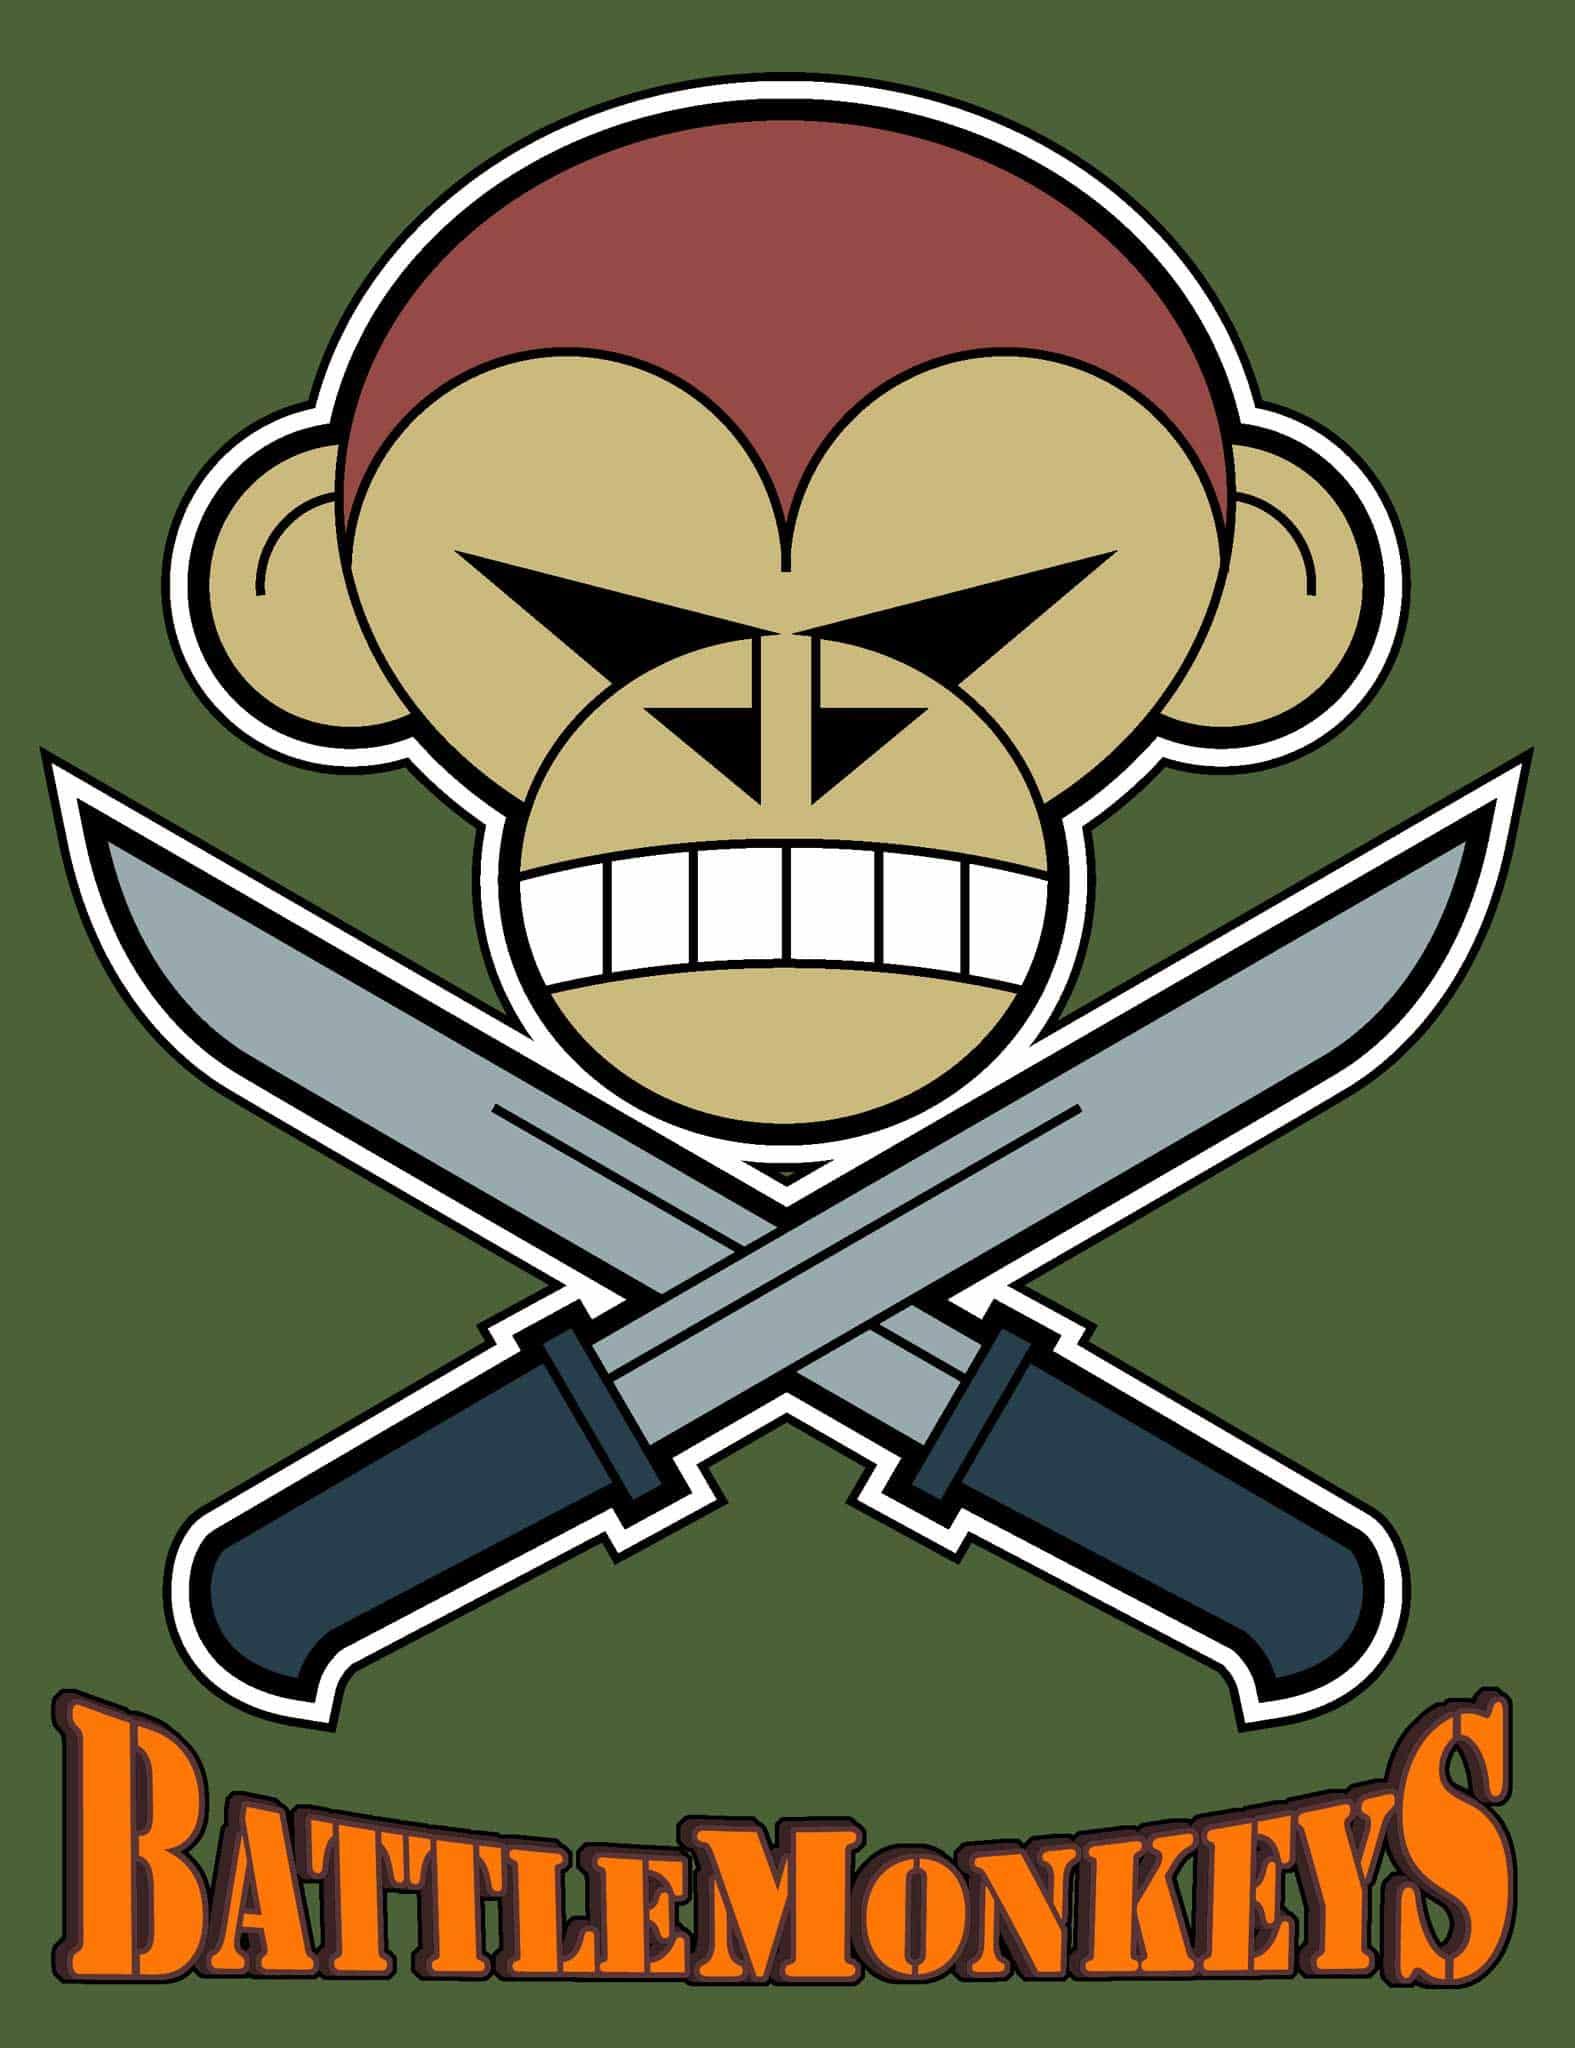 KH2900A-battle-monkeys-logo